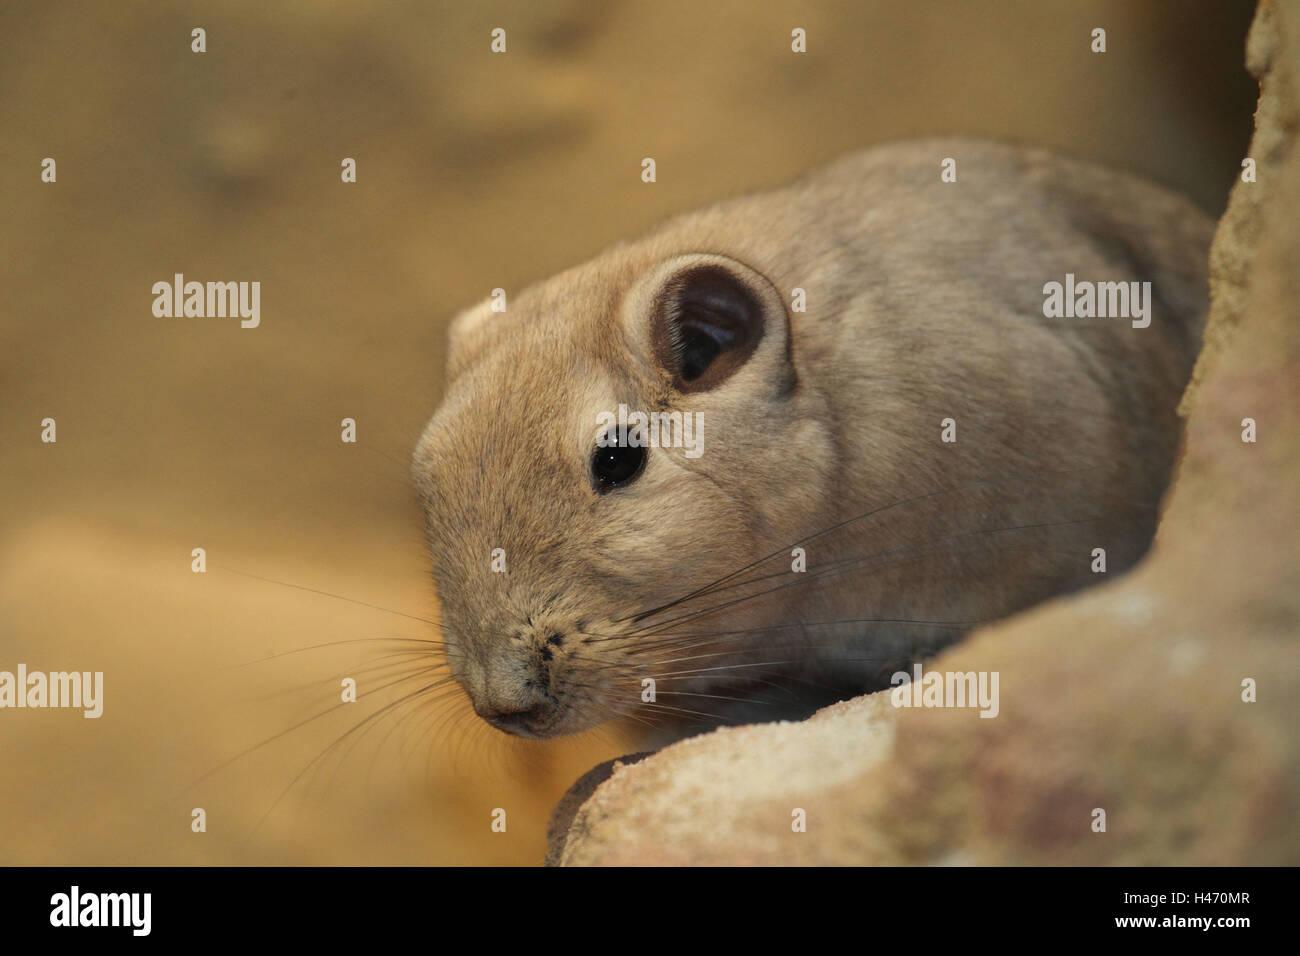 African rodent, Gundi, - Stock Image